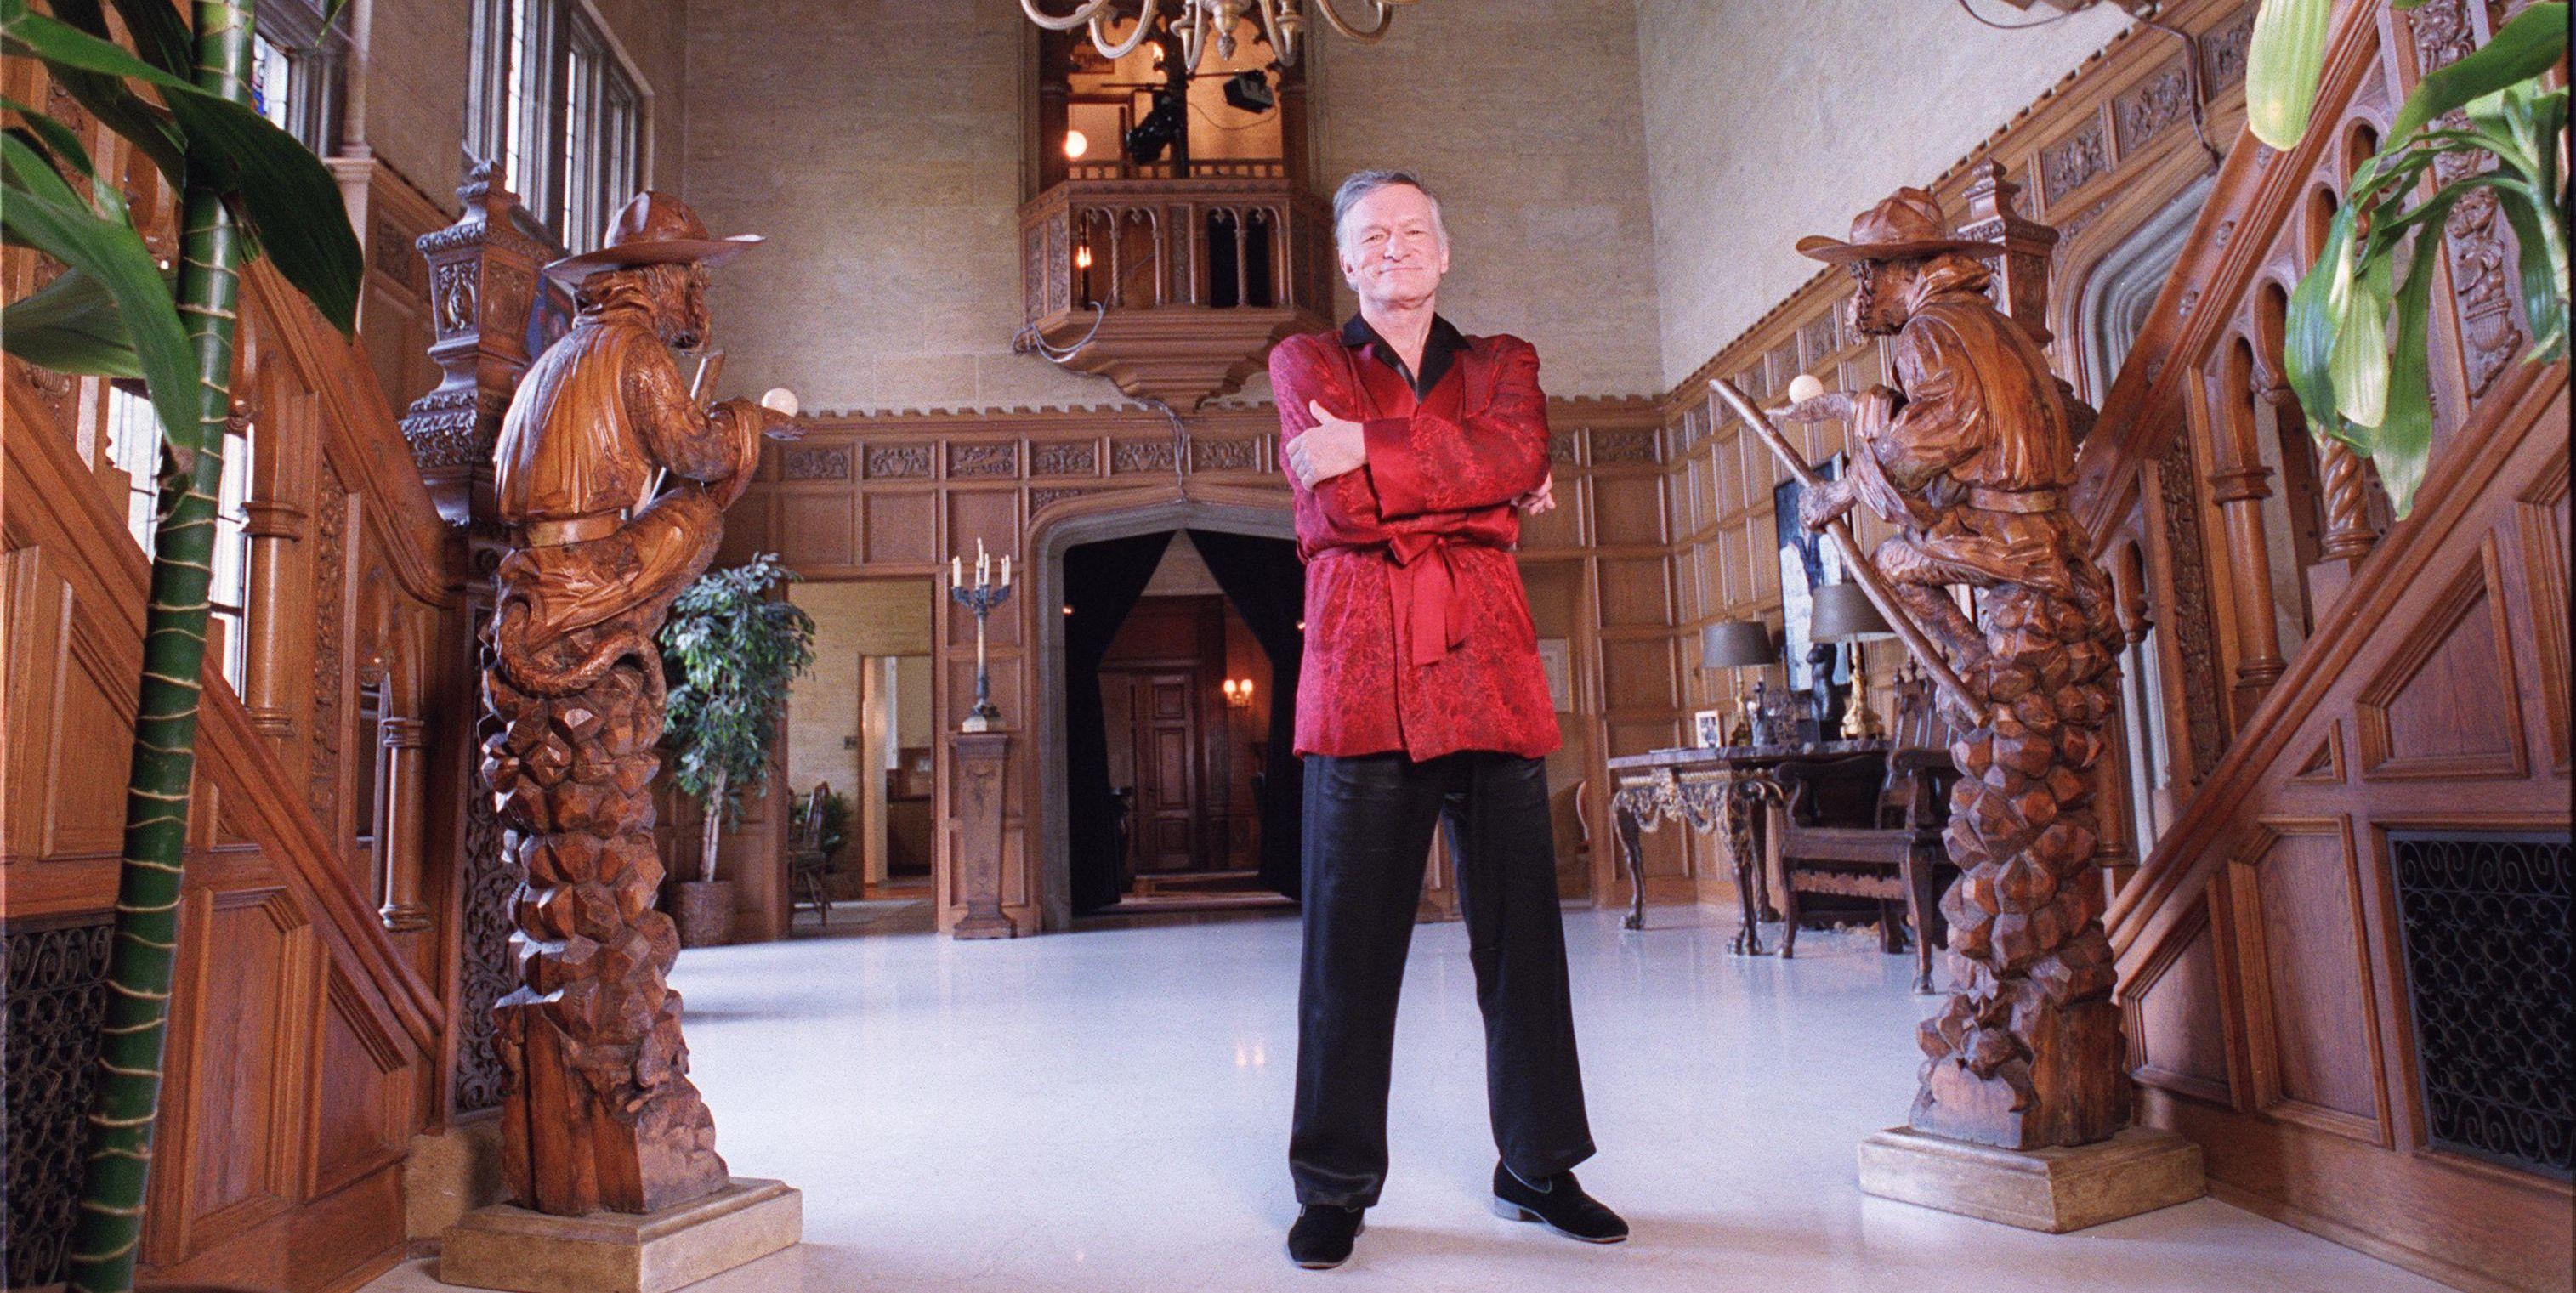 Hugh Hefner, photographed at the Playboy Mansion in 1999.